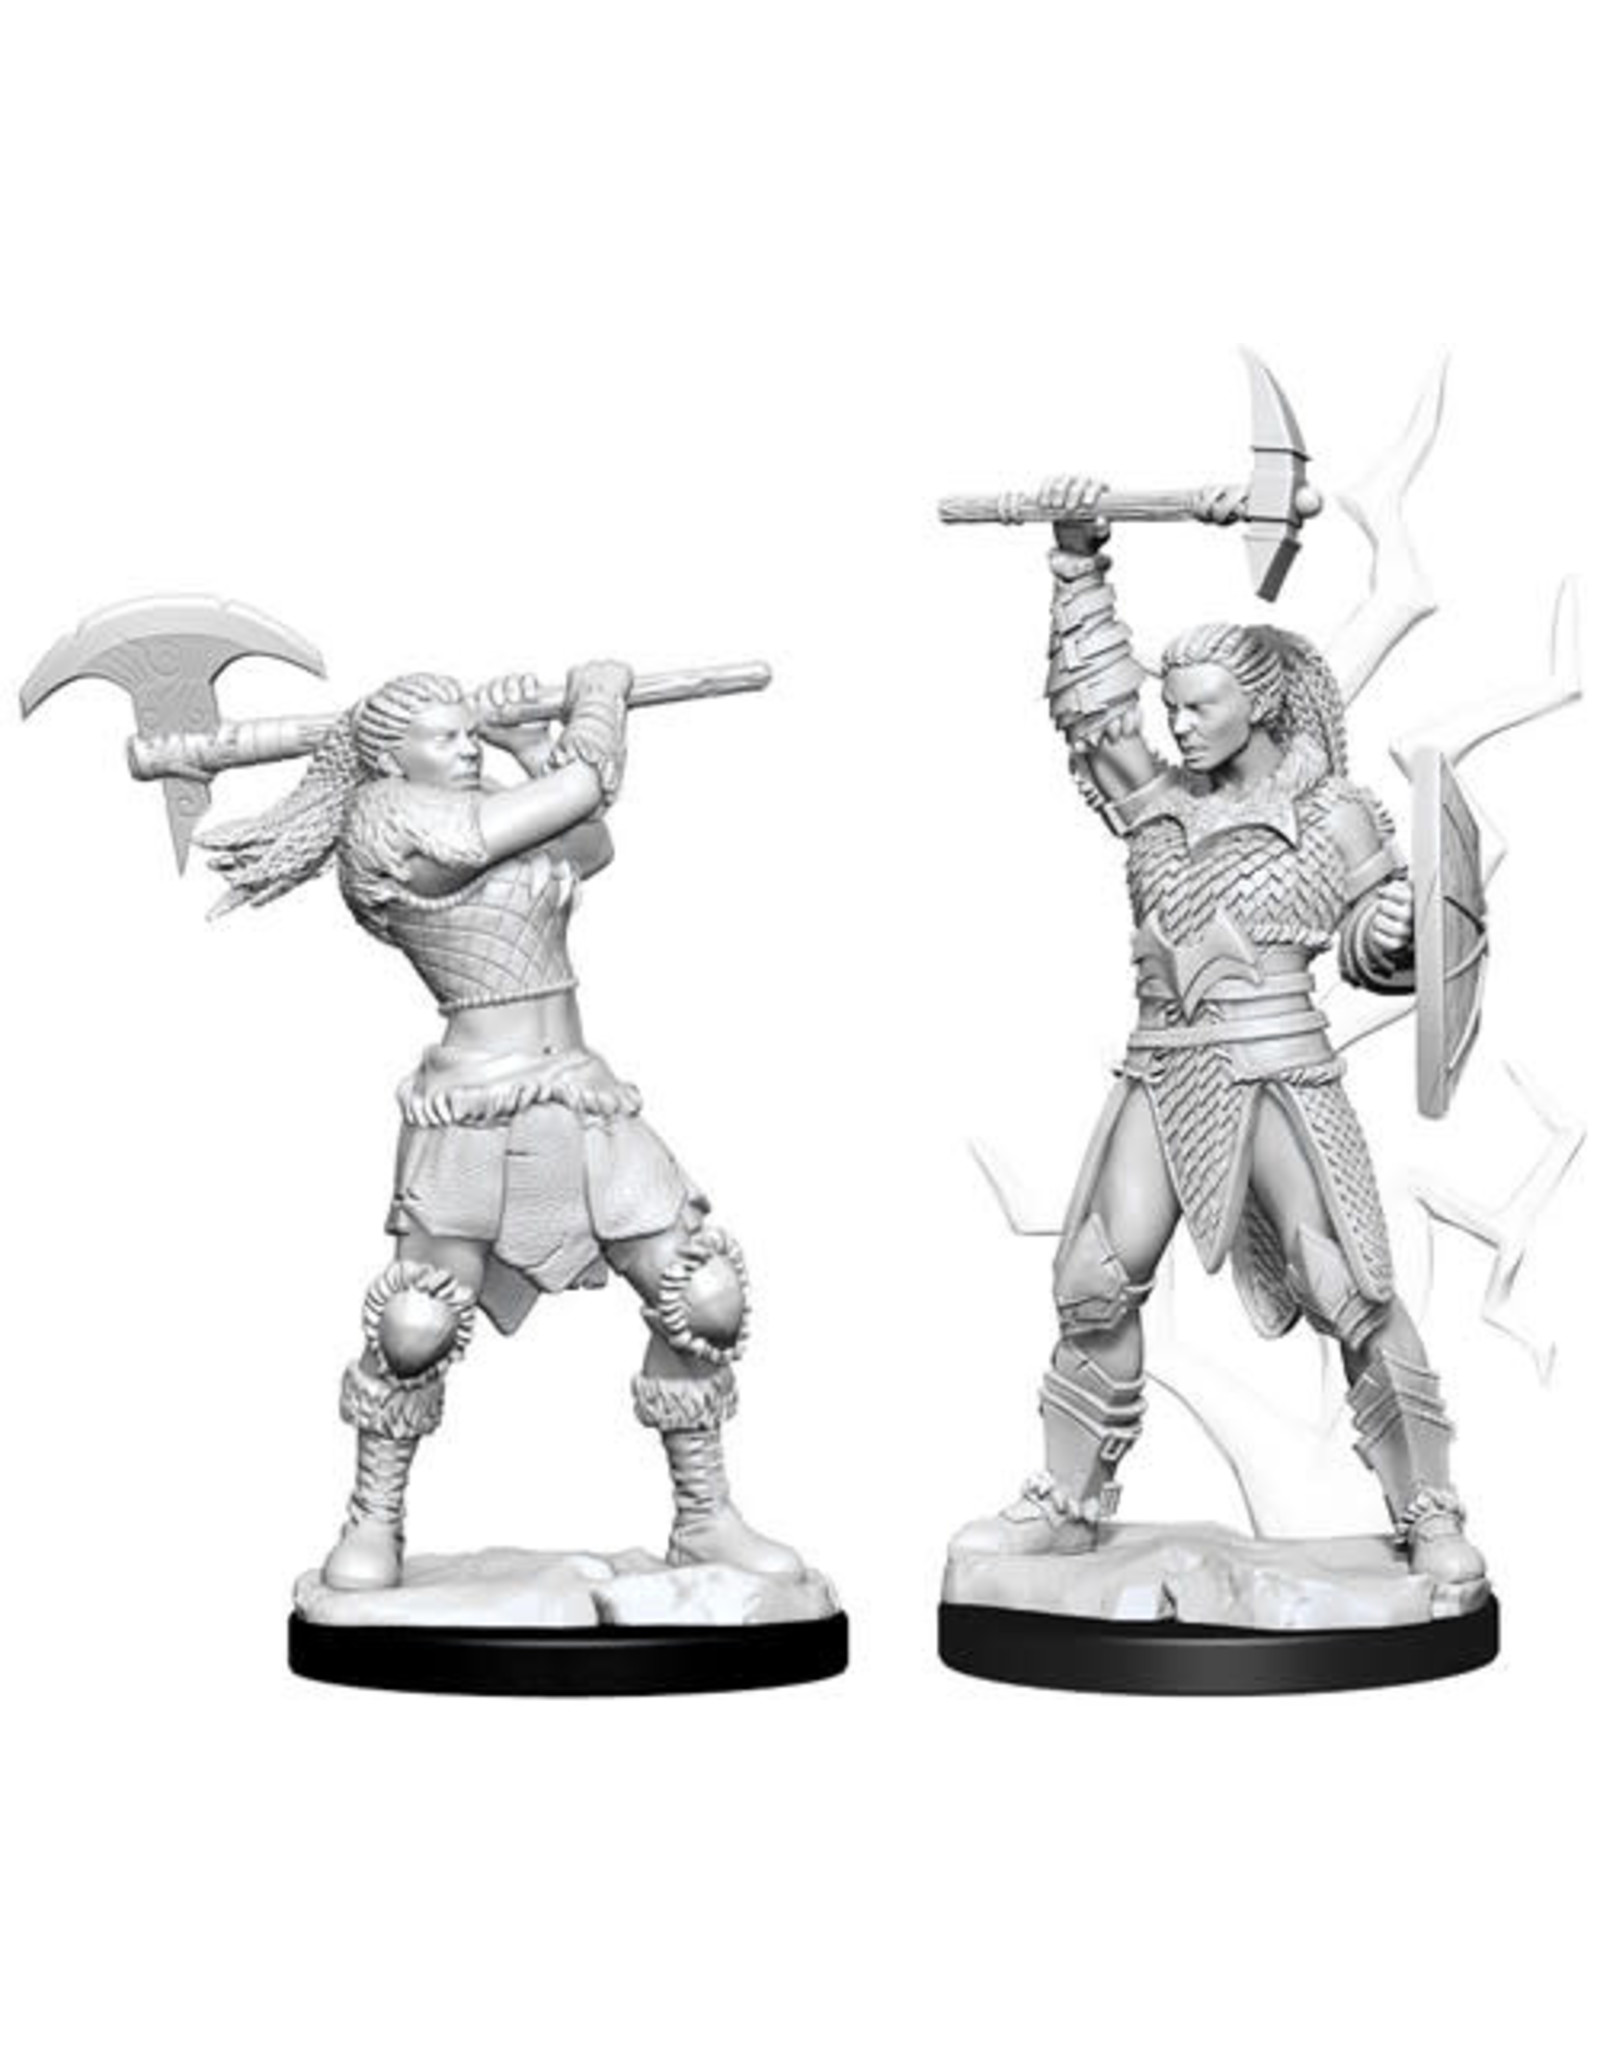 D&D Unpainted Minis: Goliath Female Barbarian (Wave 10)